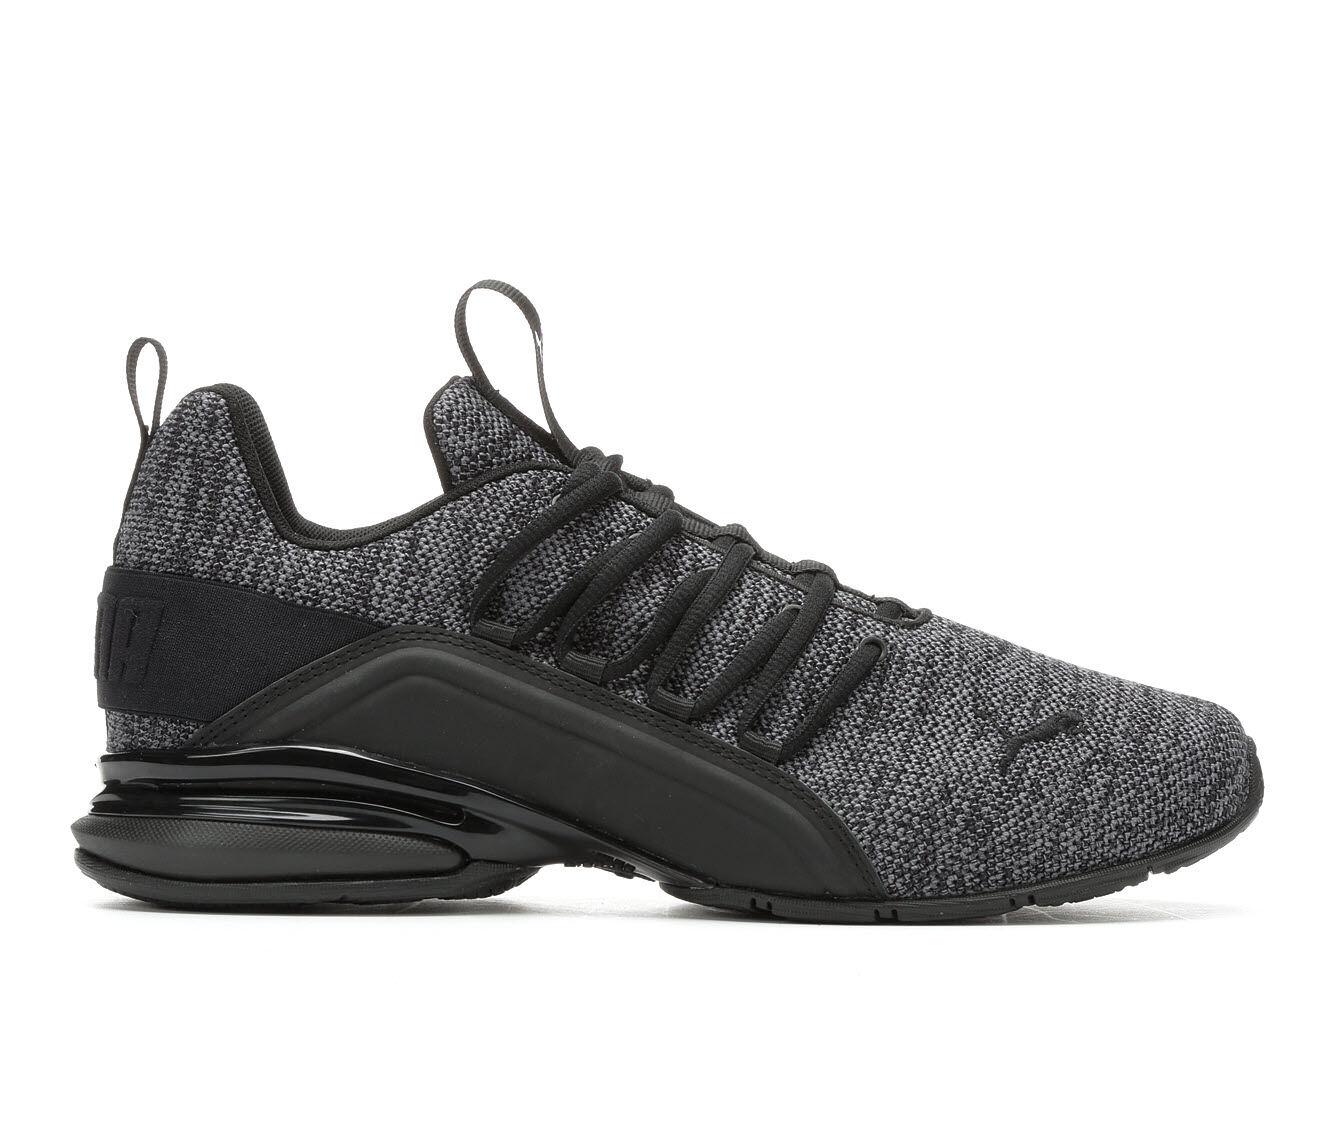 Men's Puma Axelion Knit Sneakers Grey/Black